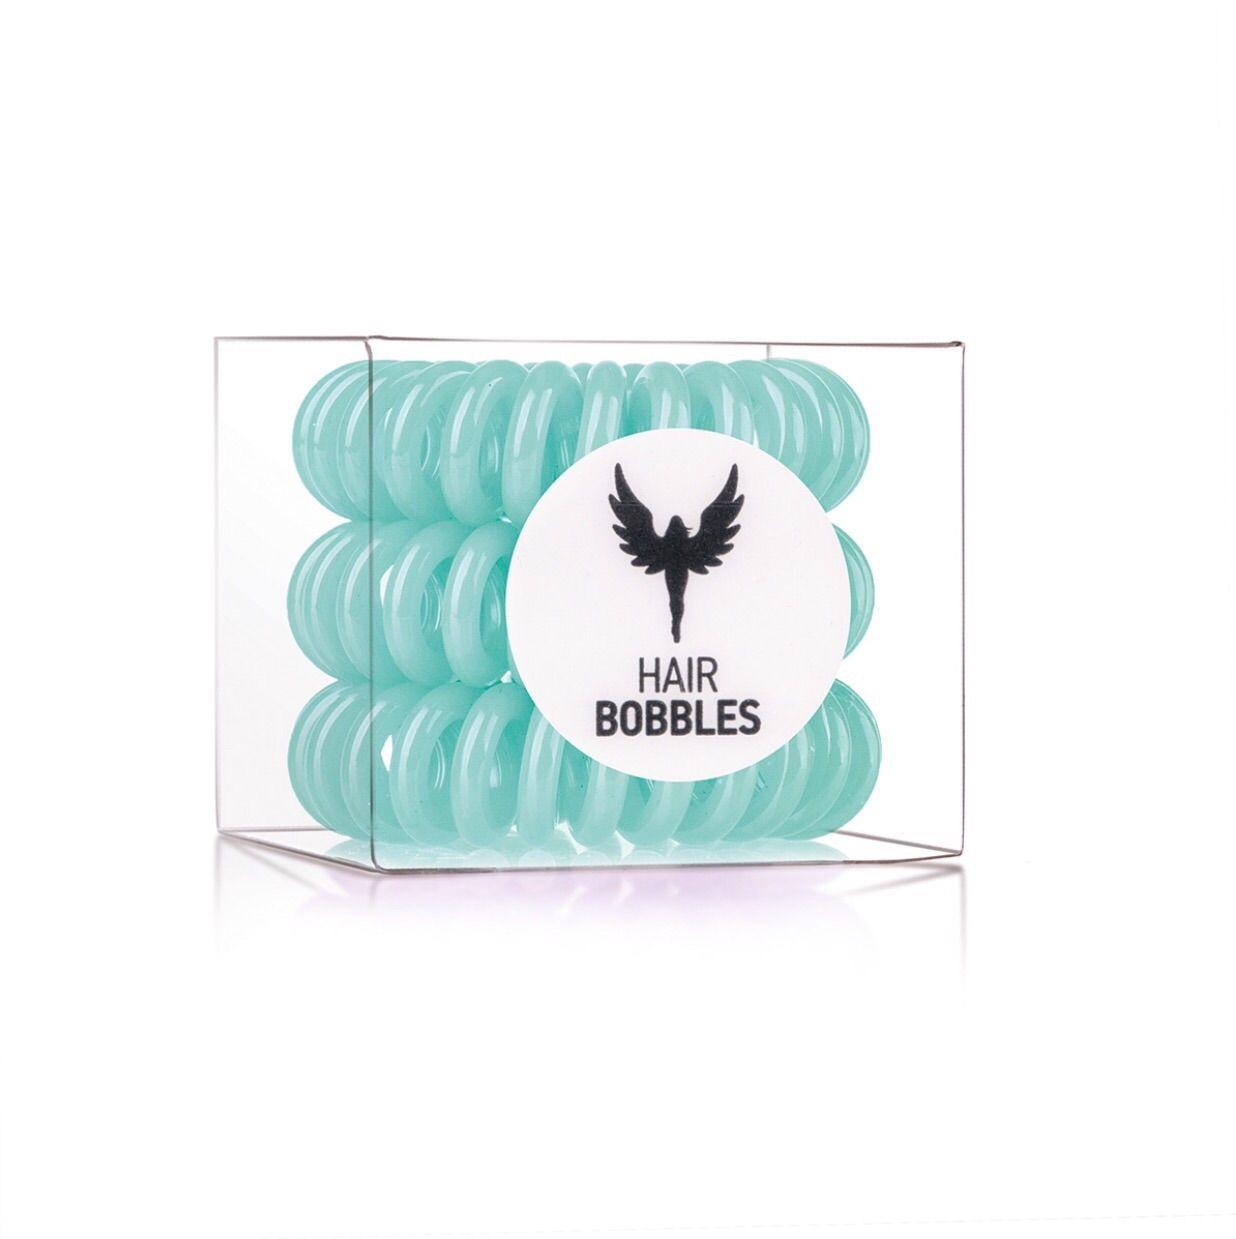 Elastico per capelli HH Simonsen Hair Bobbles verde - 3pz.